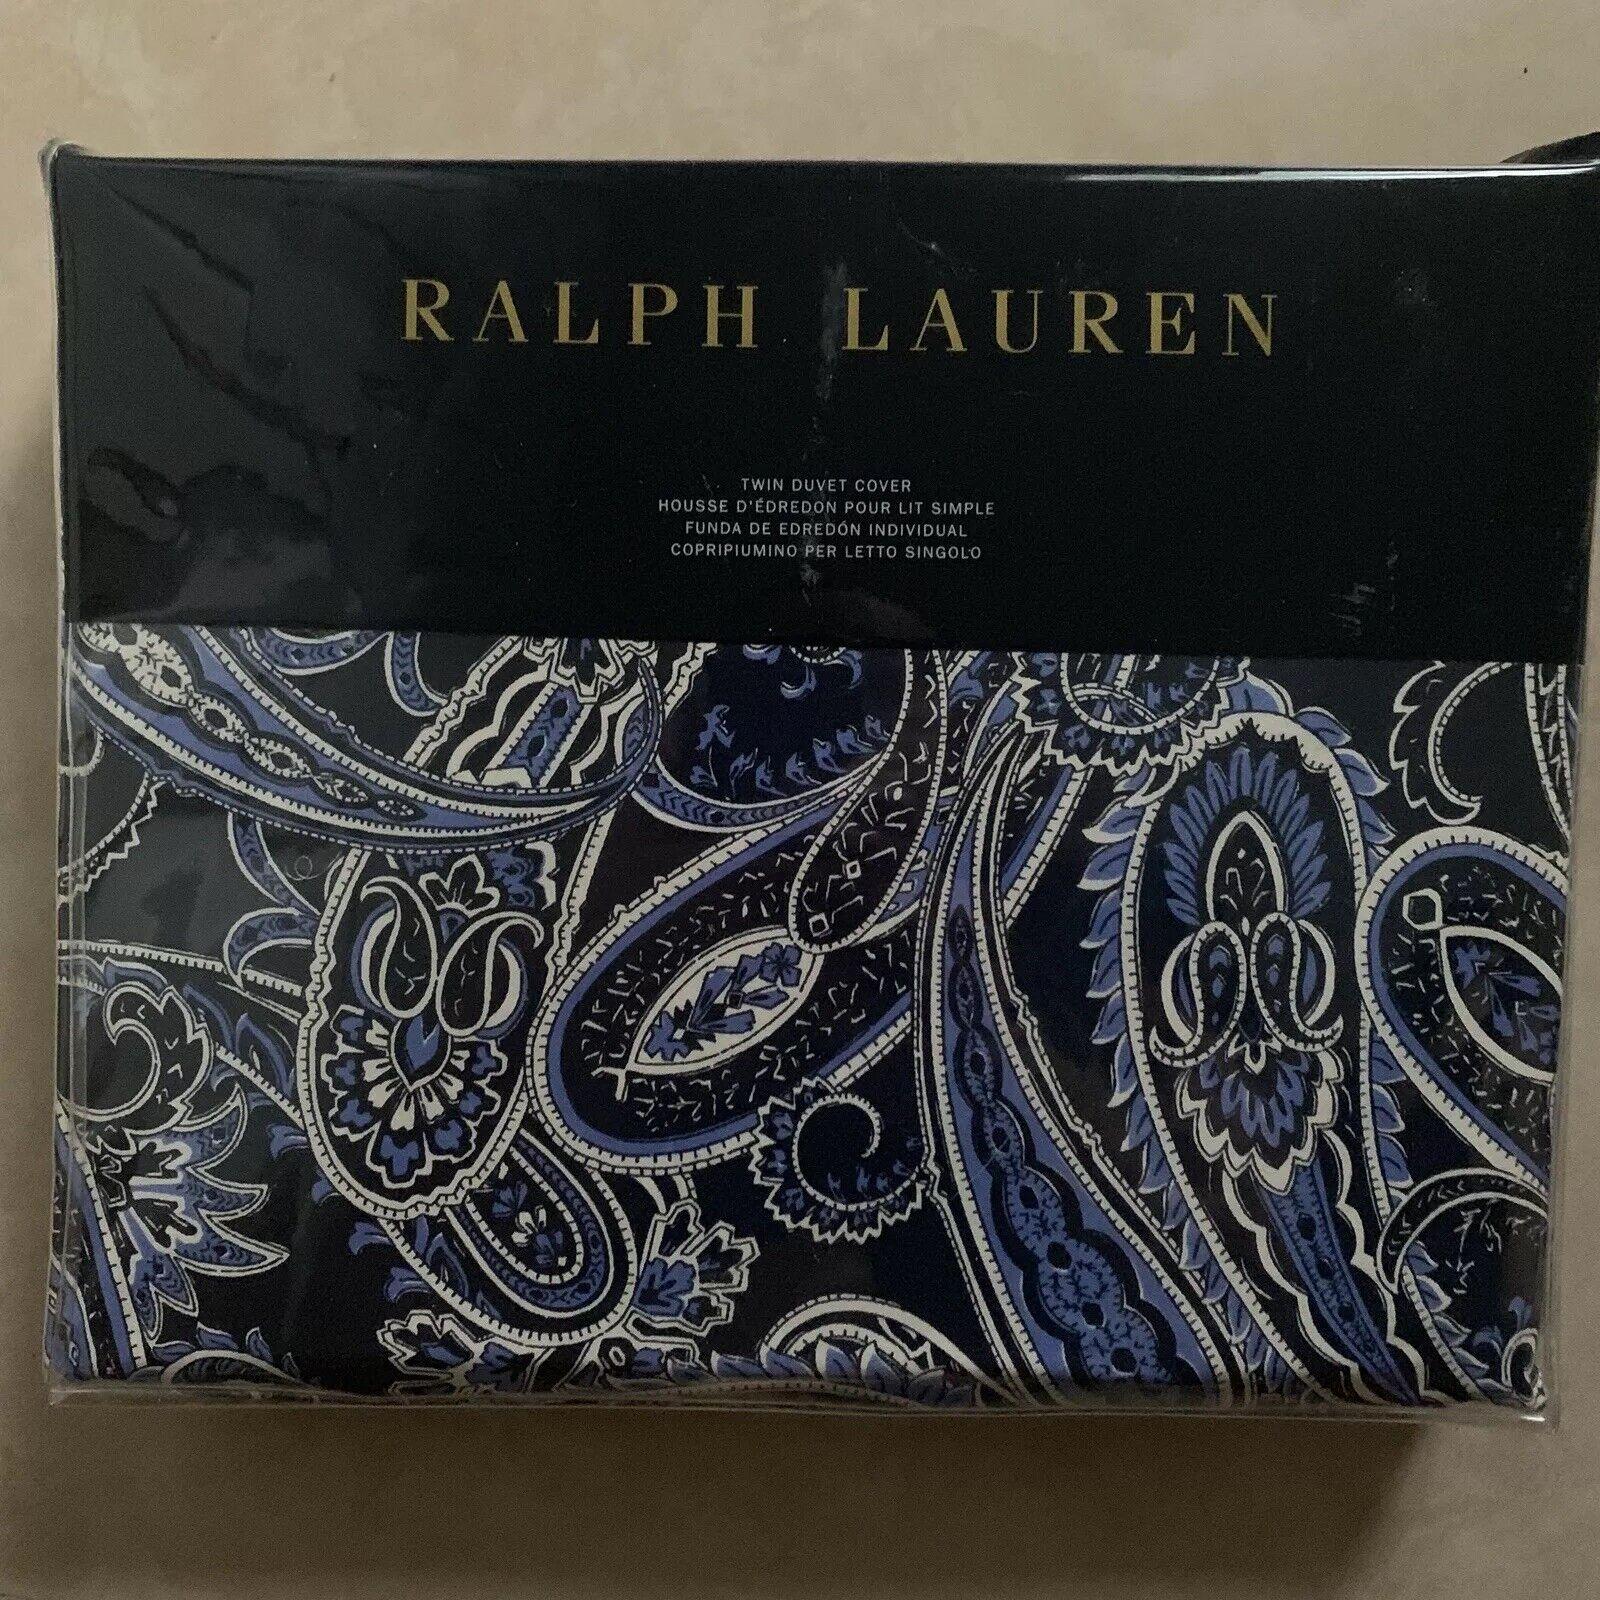 NIP Ralph Lauren Costa Azzurra Blau Paisley TWIN DUVET COVER Brand New